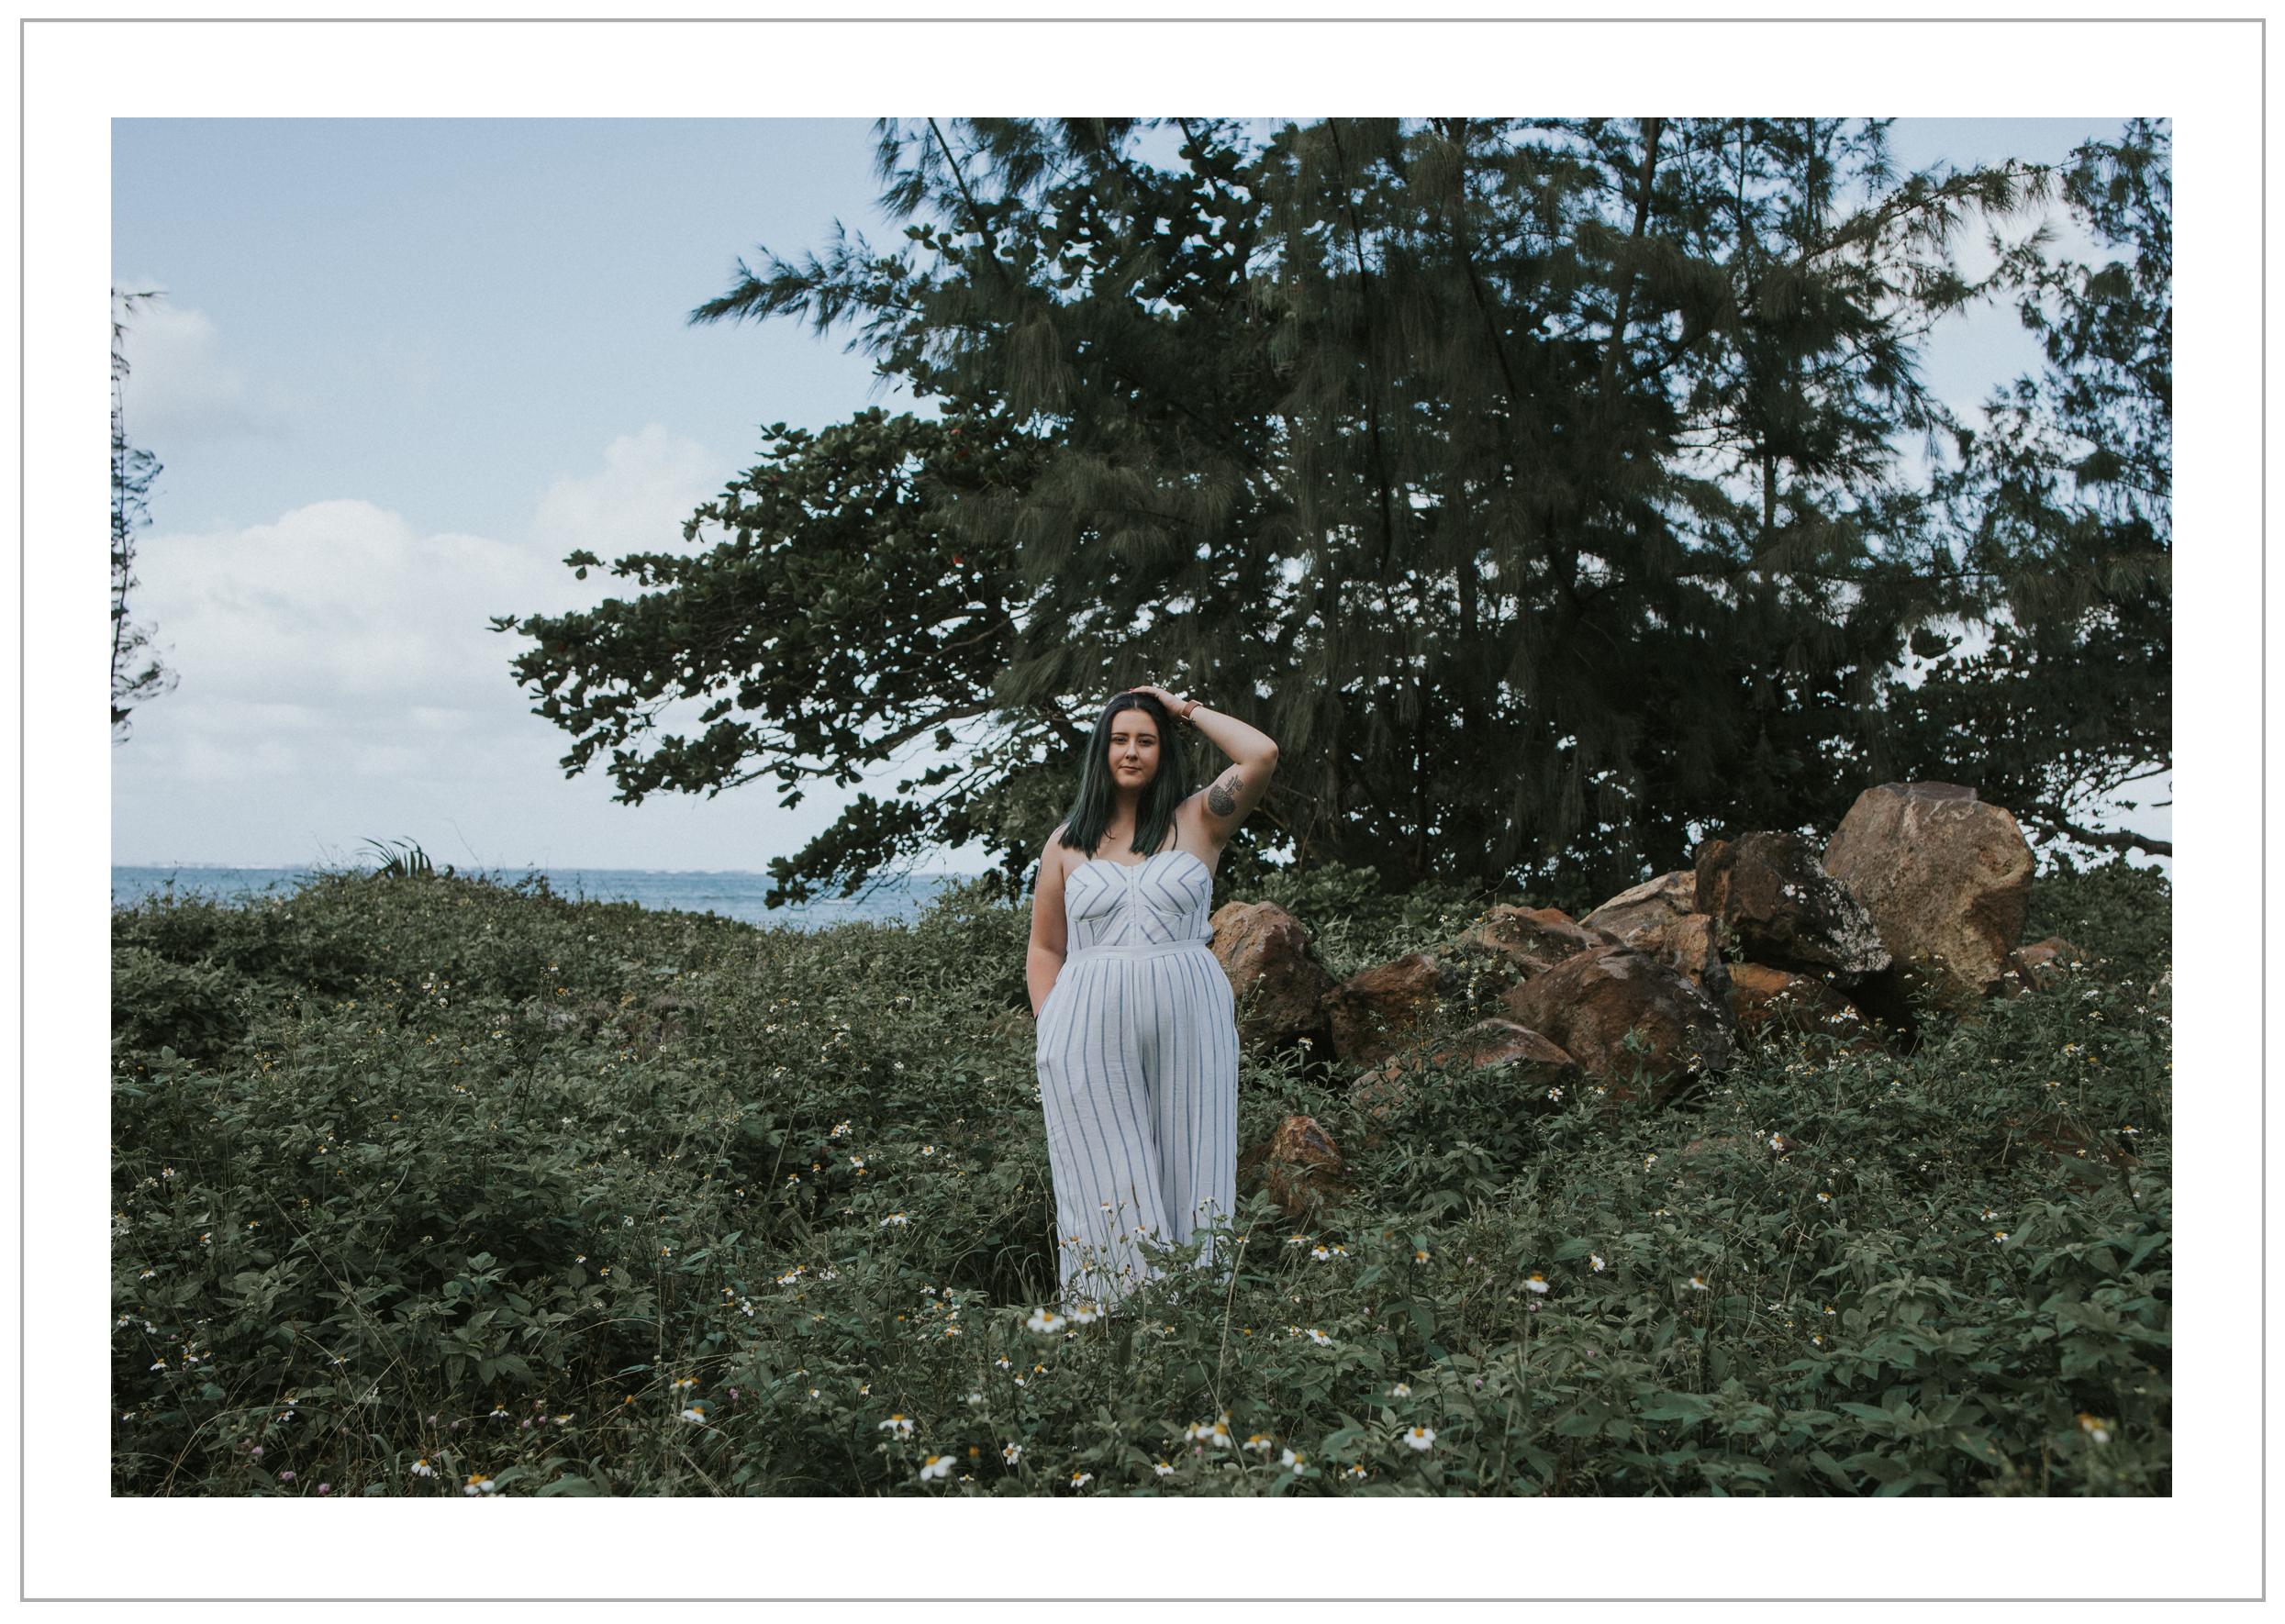 Jordan Jankun Photography, Oahu Wedding Photographer, Oahu Wedding Photography, Oahu Elopement Photographer, Oahu Elopement